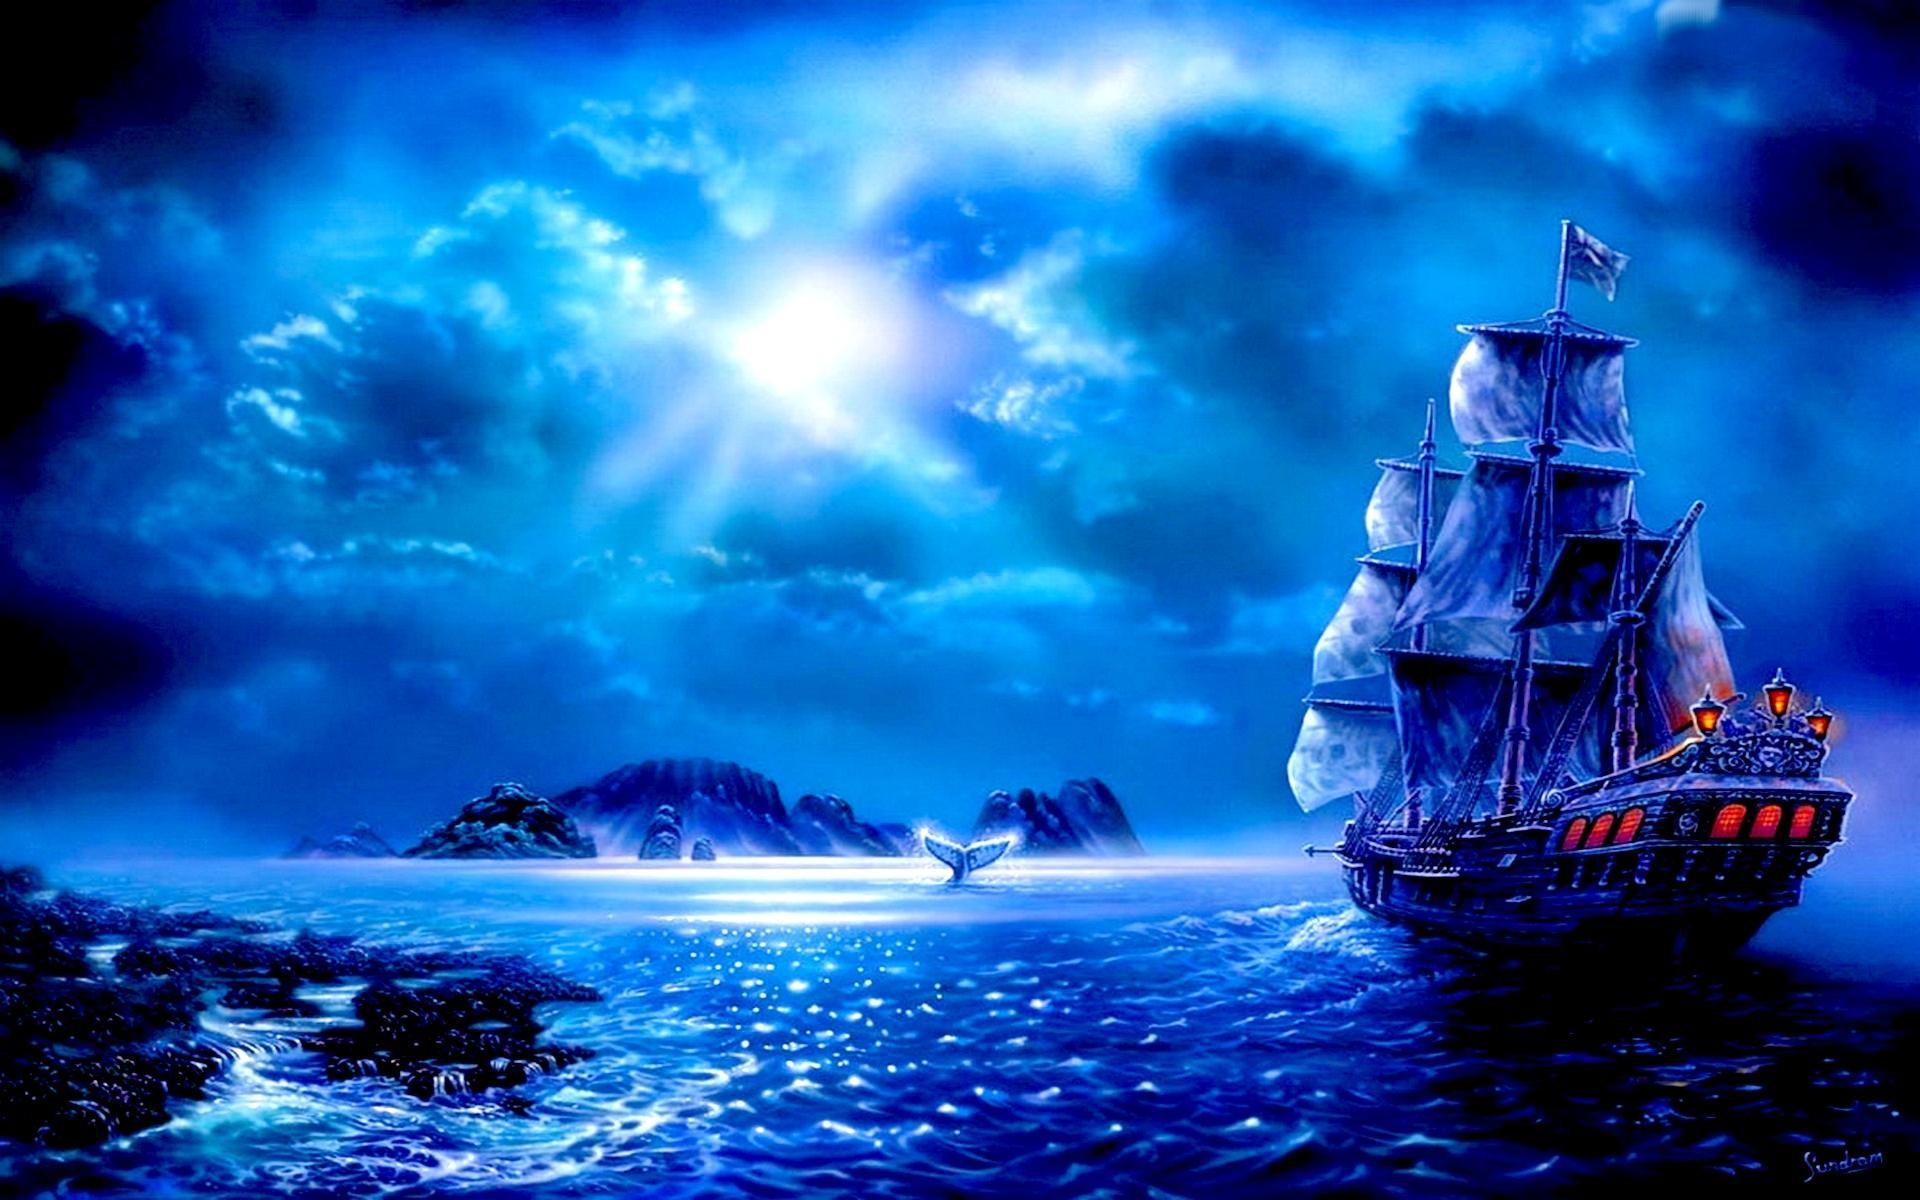 Fantasy – Ship Fantasy Blue Sailboat Moon Cloud Pirate Ocean Wallpaper